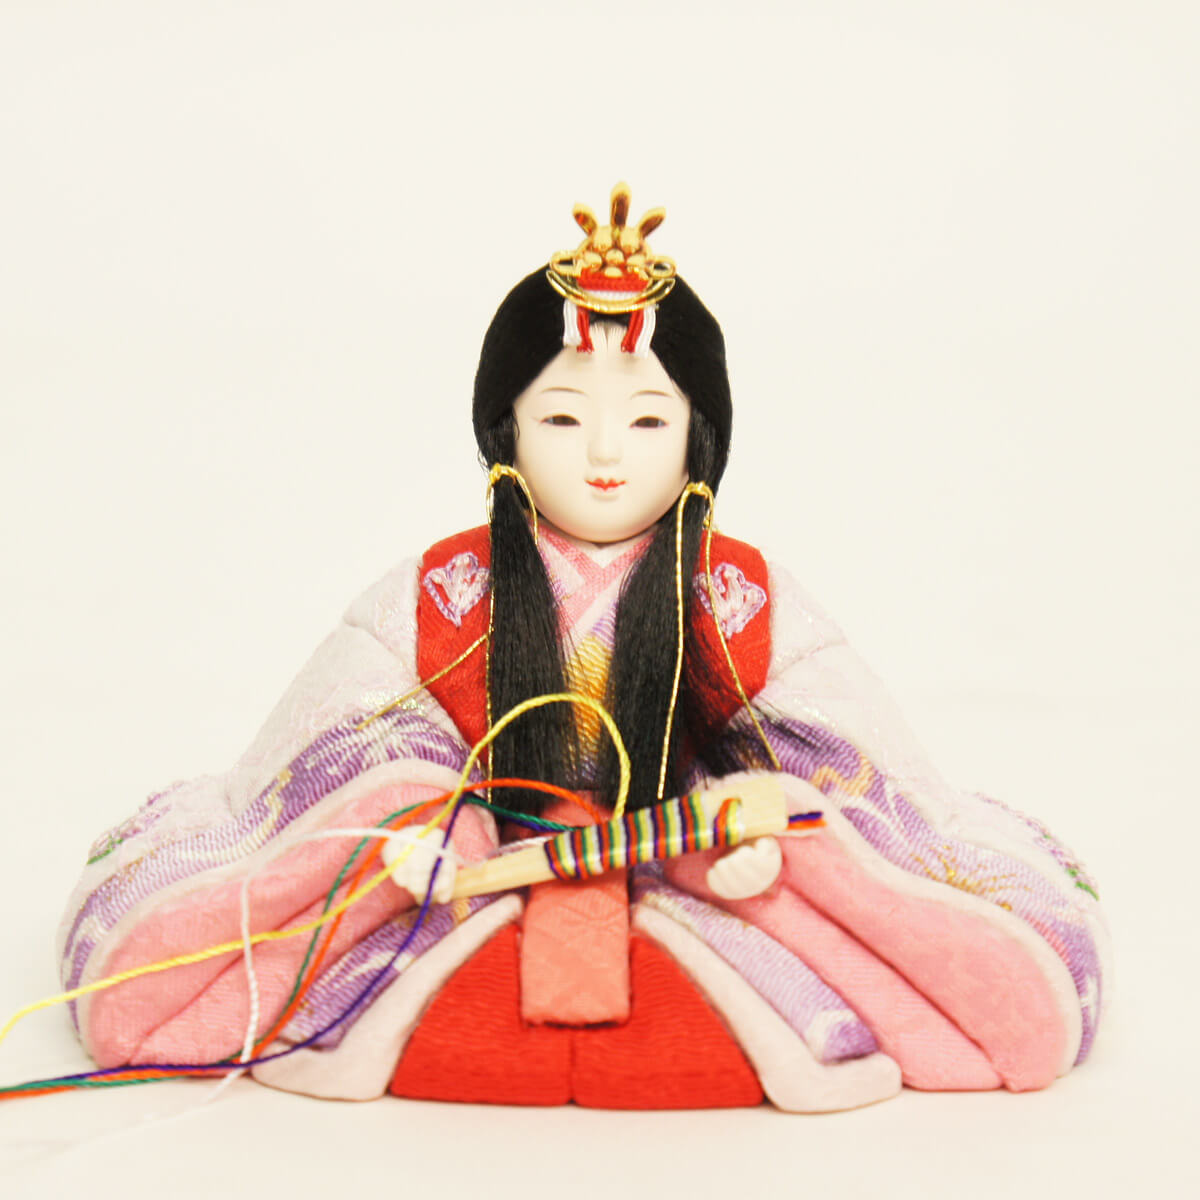 "Chicks Dim doll h., ""1 month made head sugita Ming ten Zhi original 木目込 Arai Hisao Maki chicks Prince ornament embroidery' «HNQ-68165» Dim h. Moon dolls chicks doll h.-[P10]"